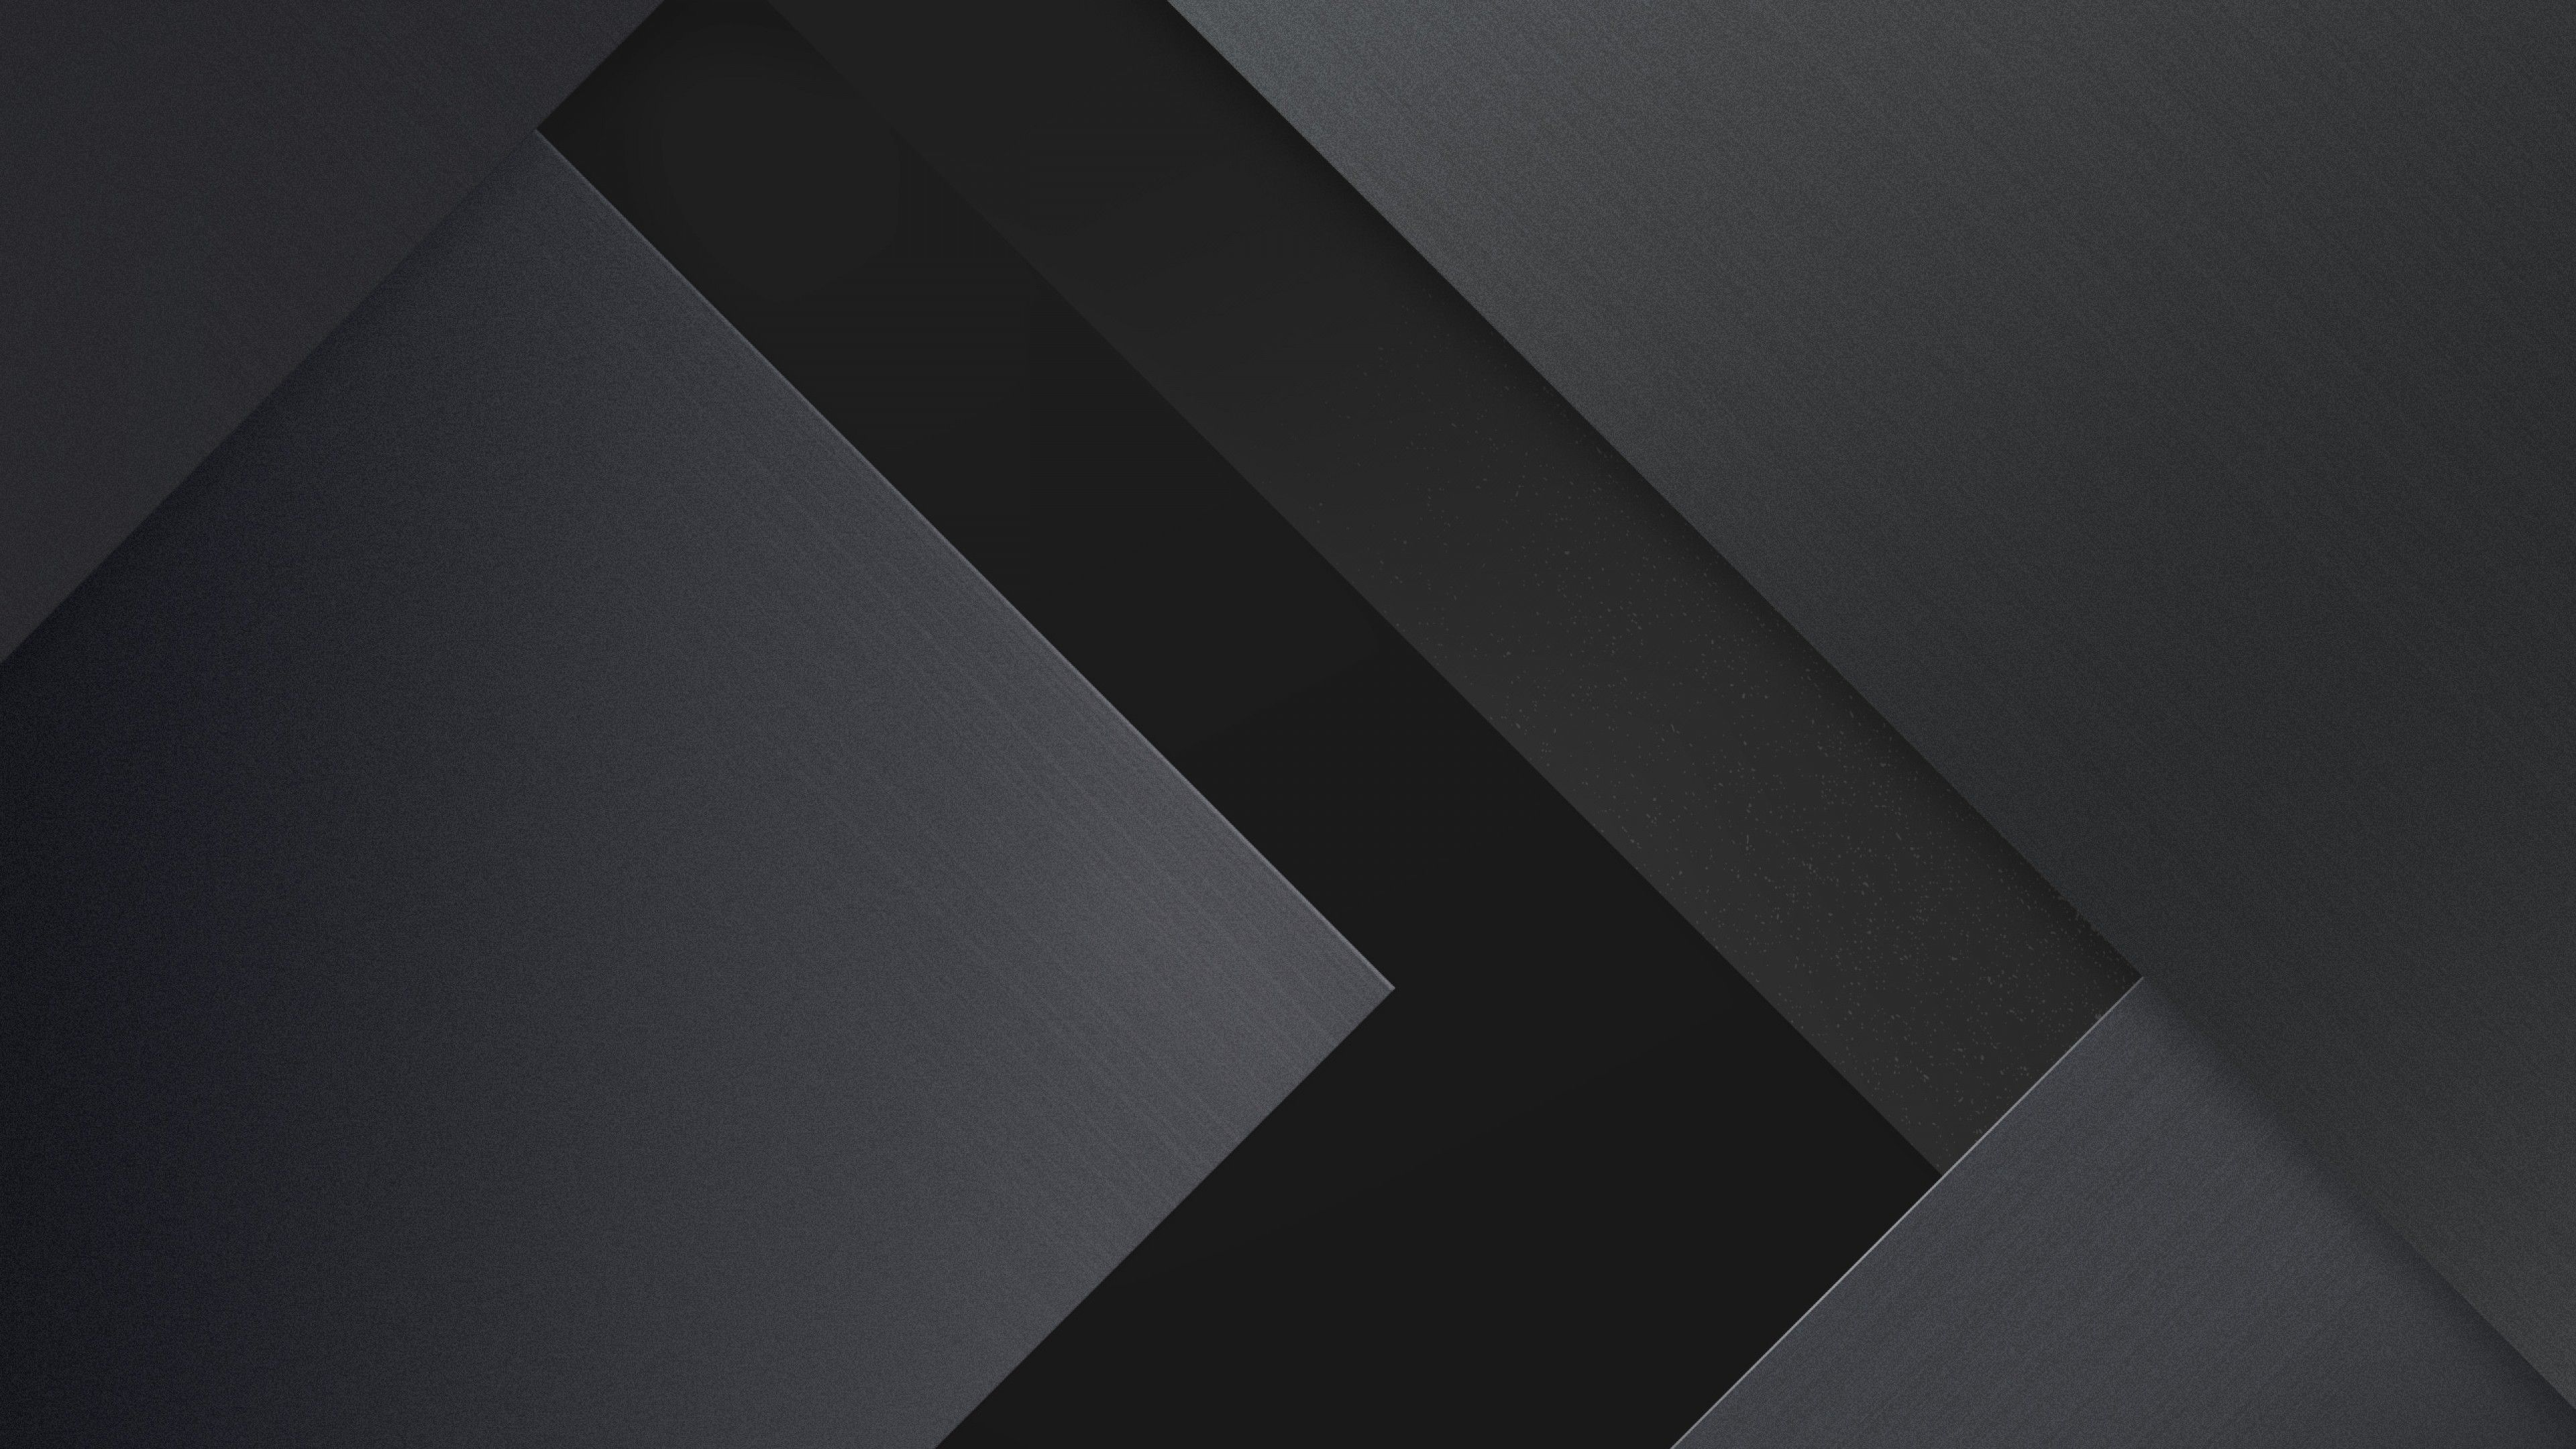 Dark Design Wallpapers Top Free Dark Design Backgrounds Wallpaperaccess